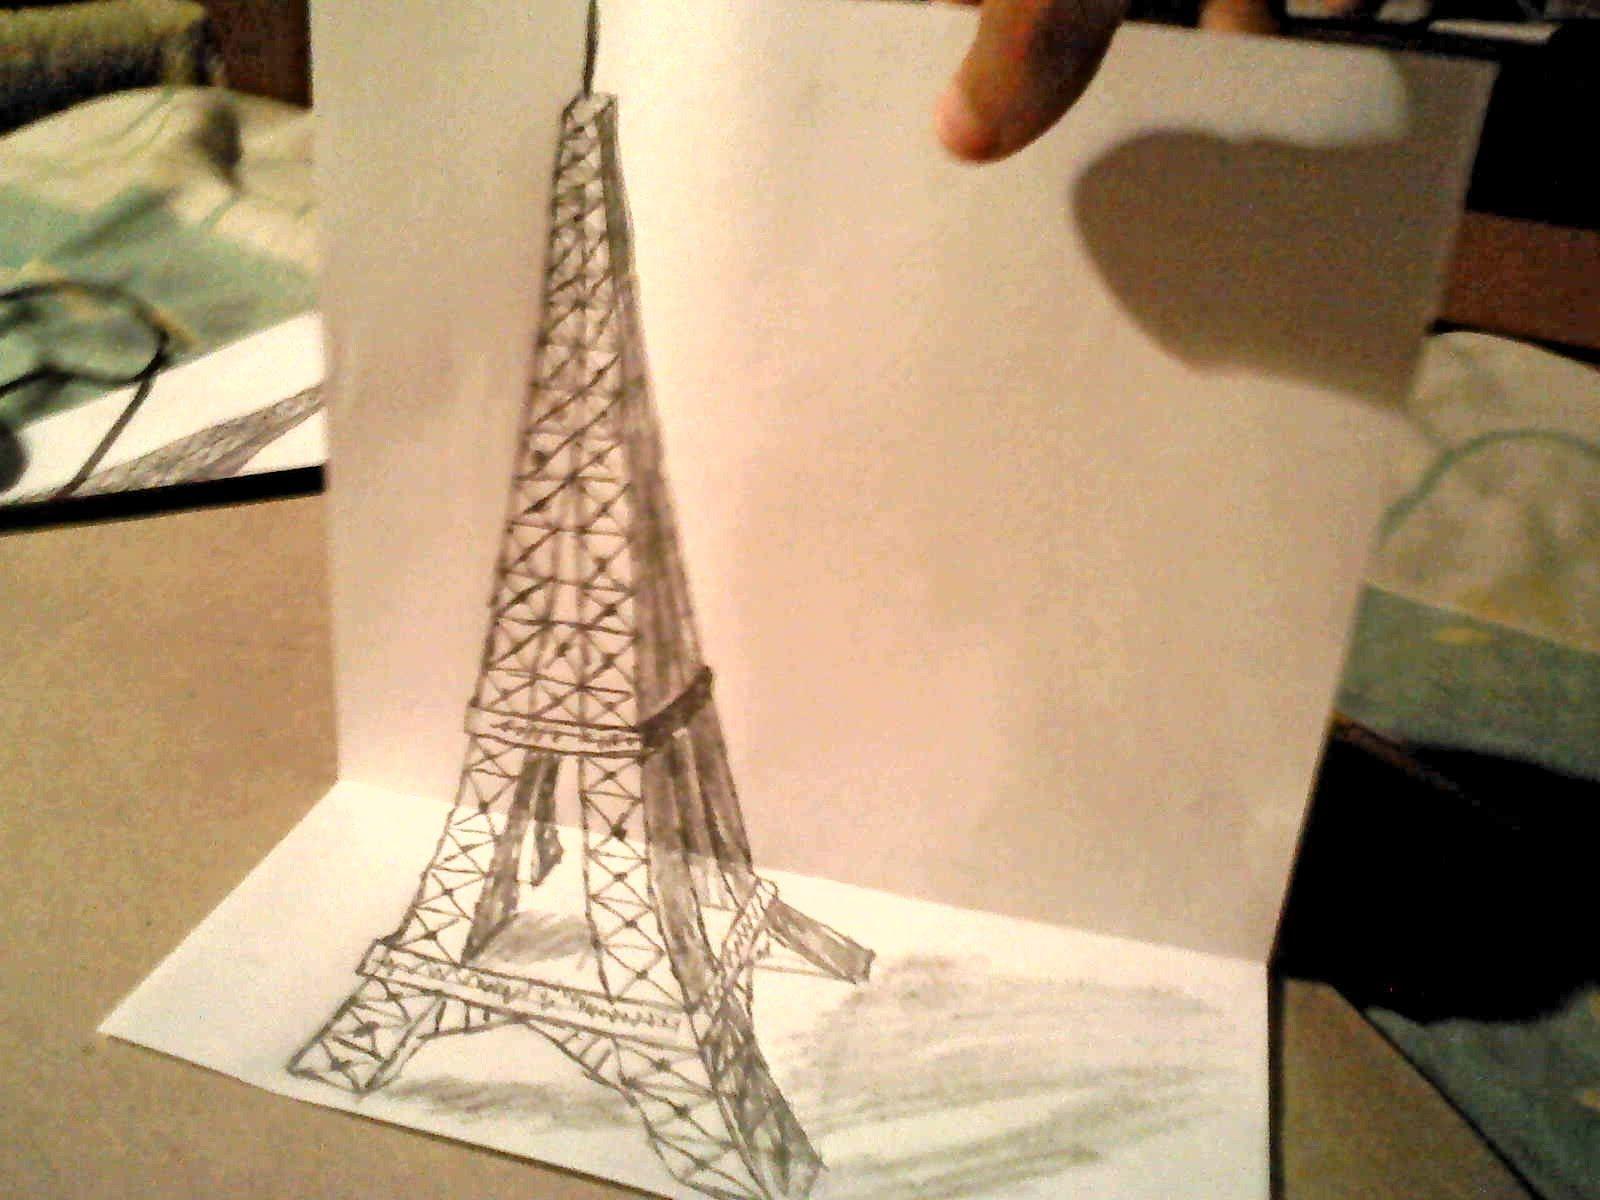 Como Dibujar La Torre Eiffel 3d Dibujo 3d Torre Eiffel Dibujo Torre Eiffel Dibujos 3d